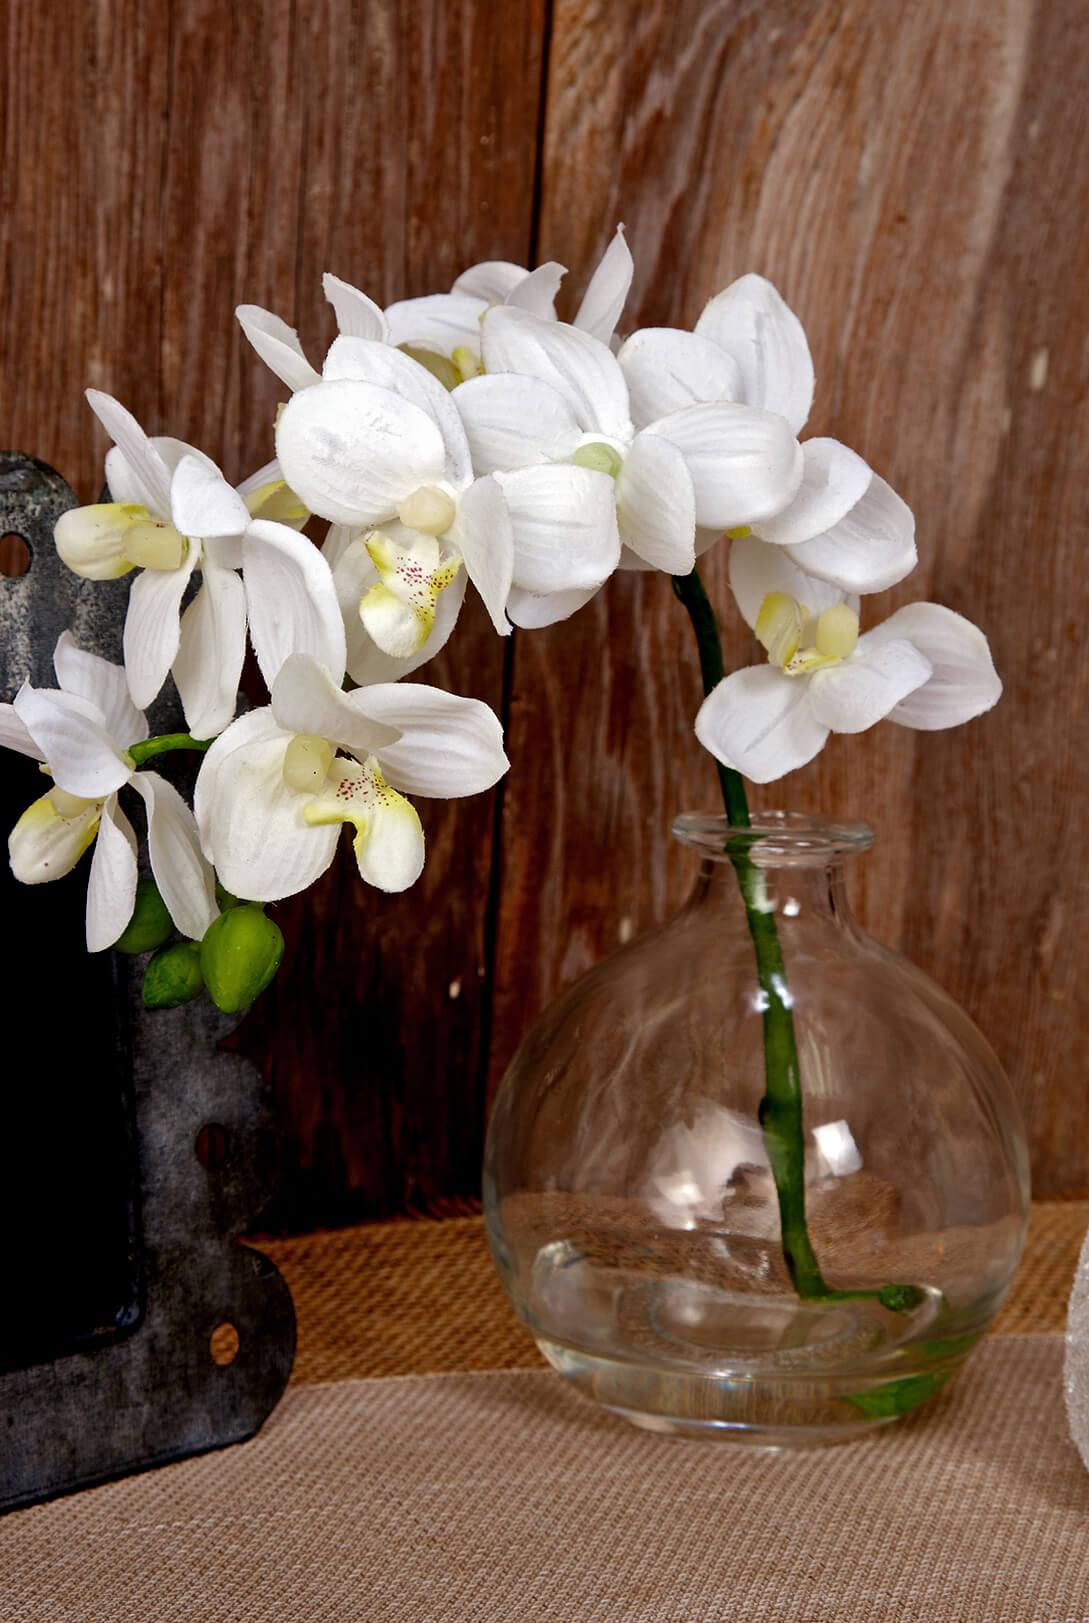 10 Phalaenopsis Orchid In Glass Vase Cream